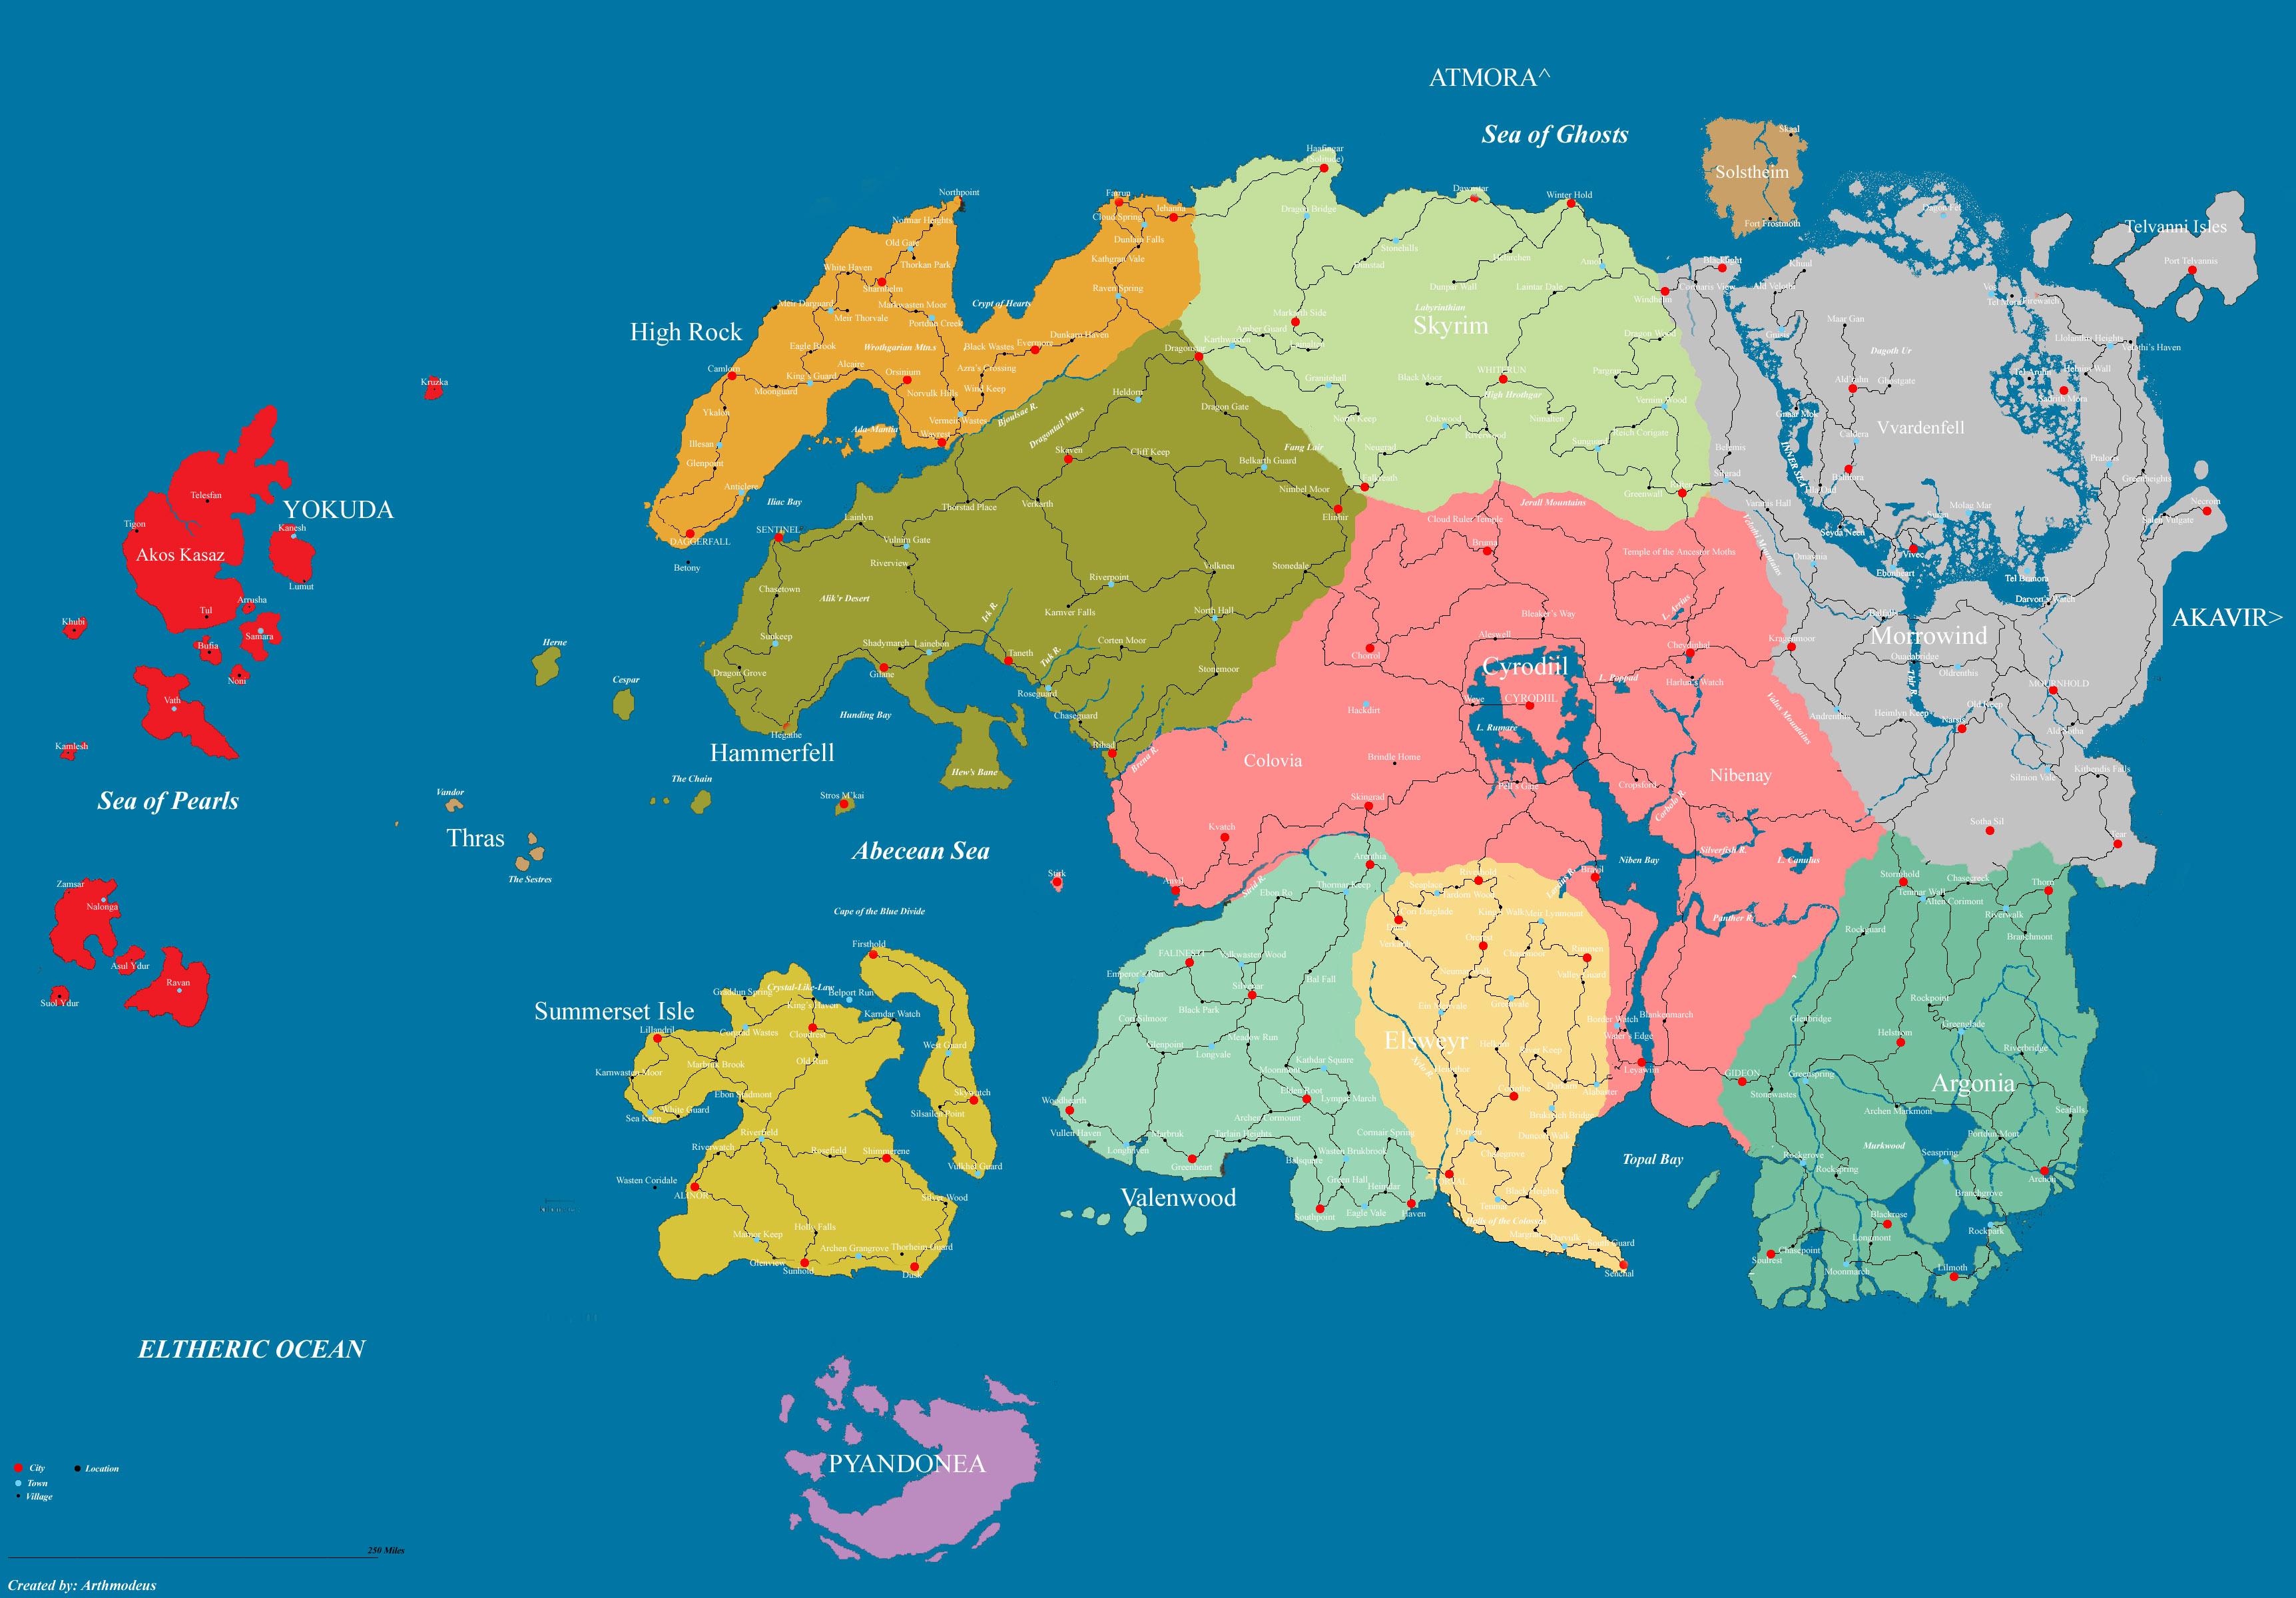 Political Map of Tamriel - by ArthmodeusD